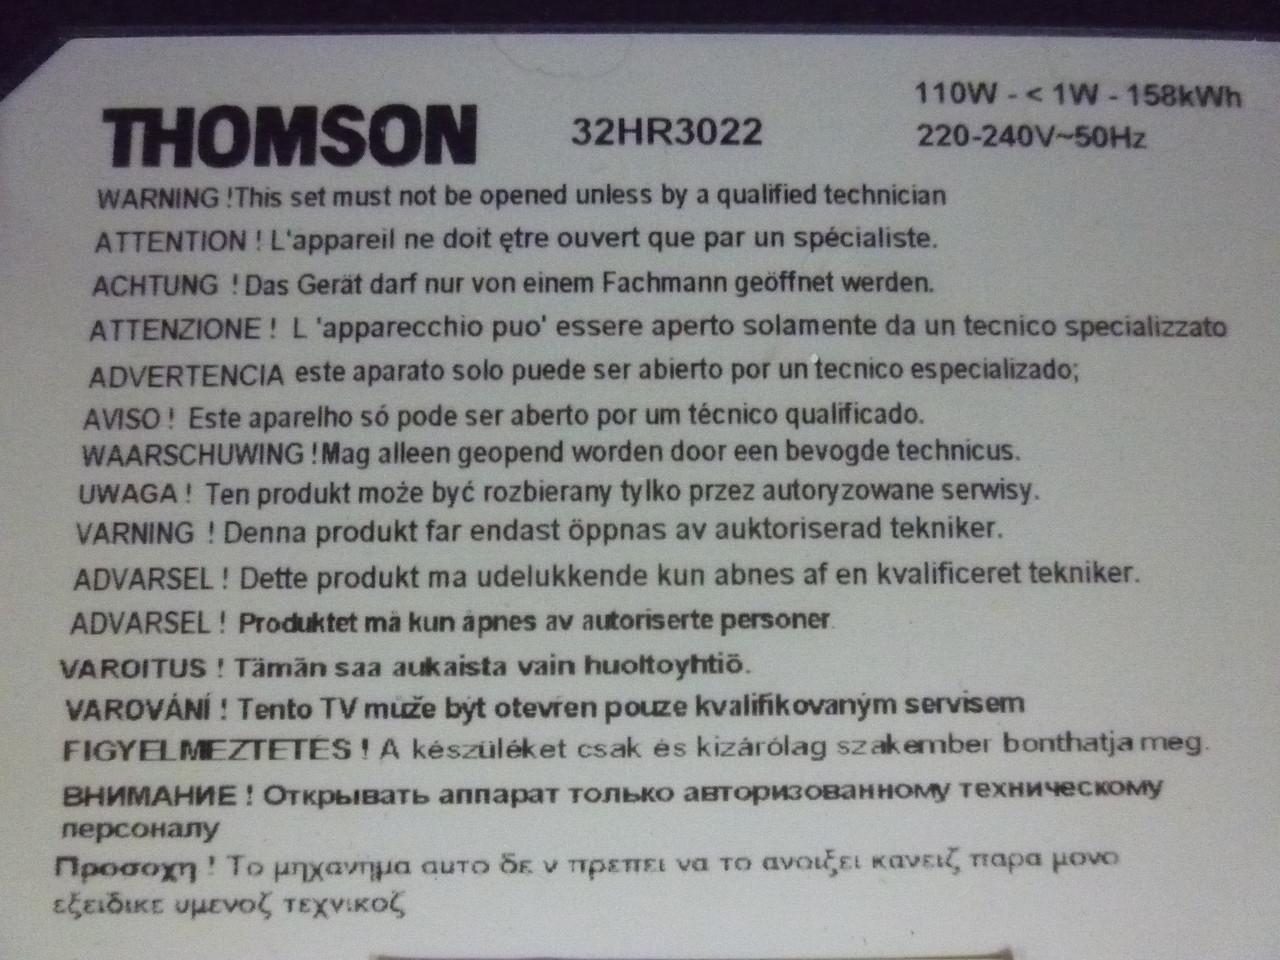 Платы от LCD TV Thomson 32HR3022 поблочно.